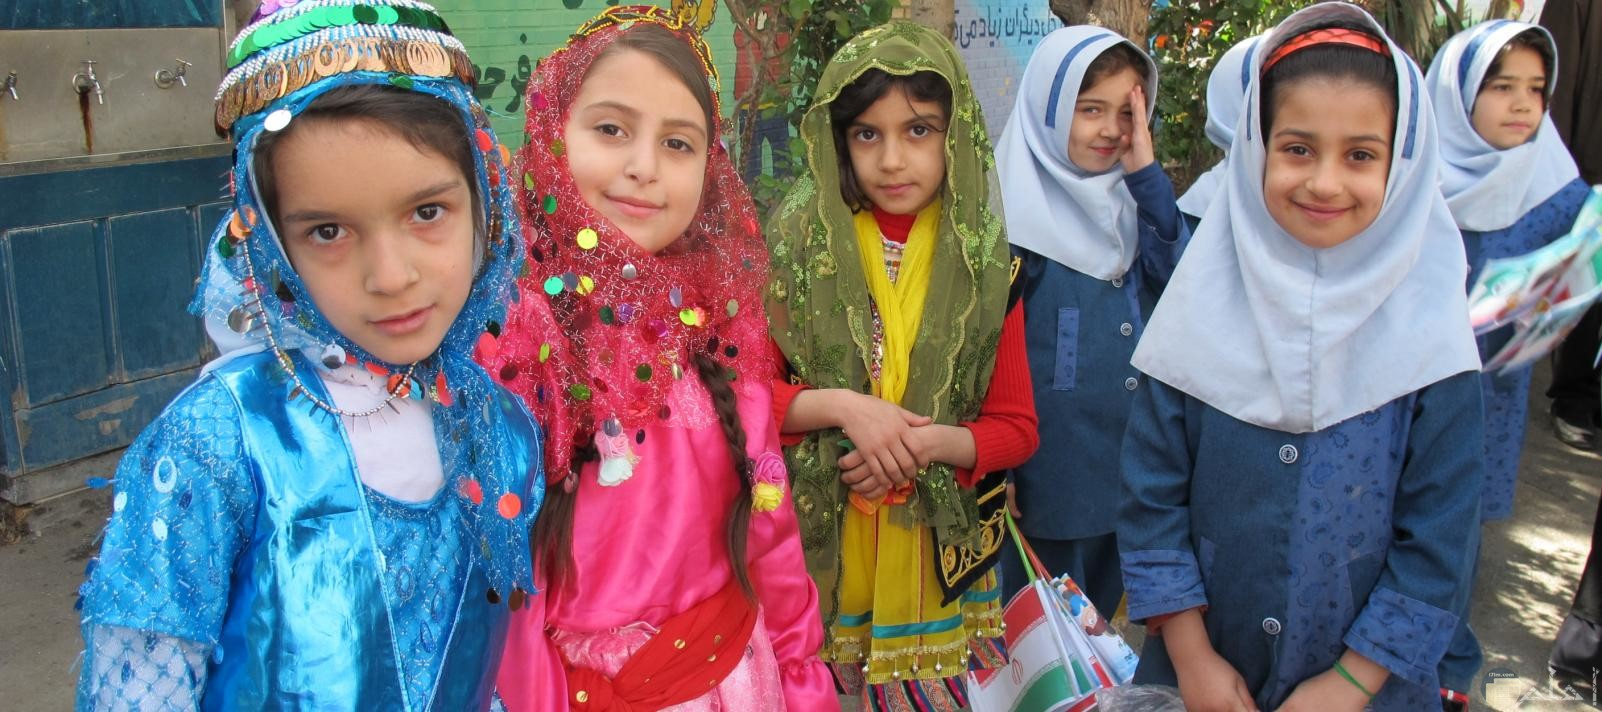 مجموعه فتايات صغار بالحجاب